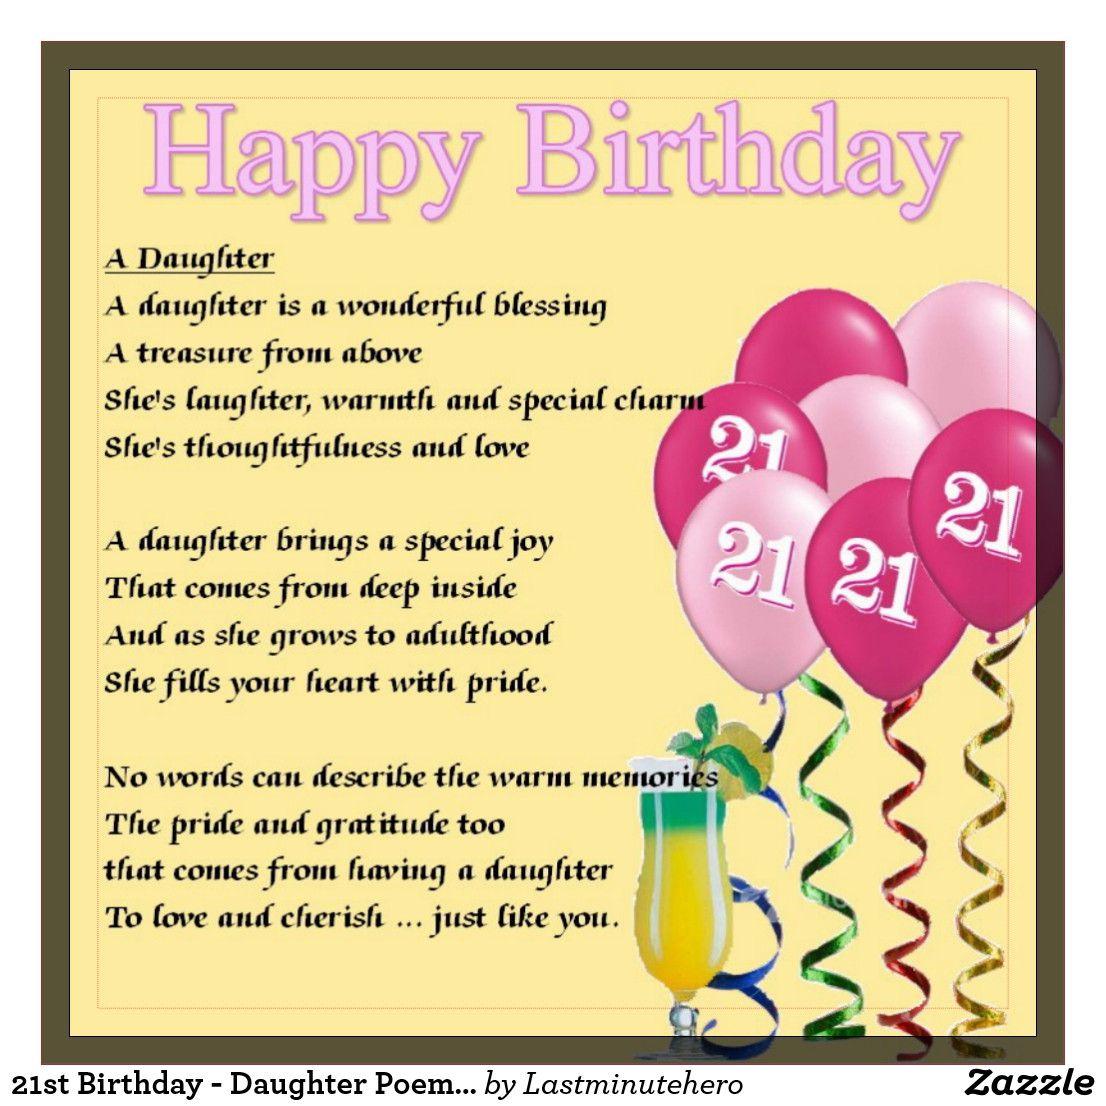 Geburtstagswunsche Tochter Geburtstag Best Of Geburtstag Tochter 40